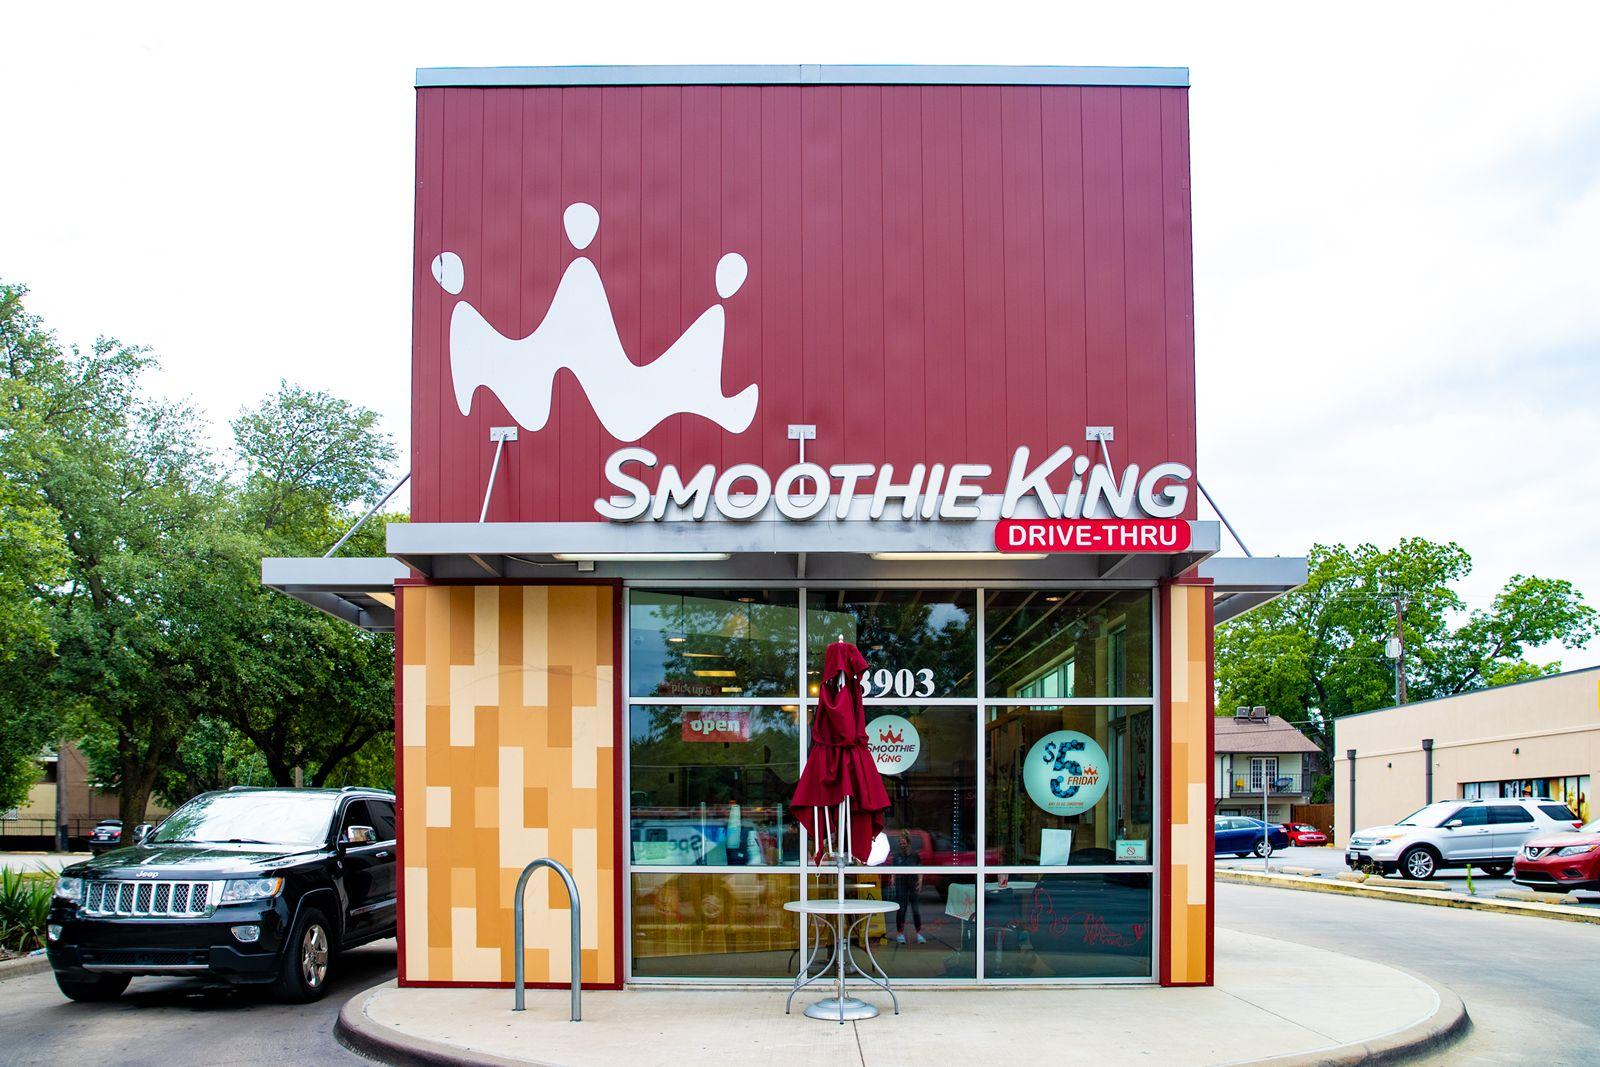 Smoothie King Achieves Stellar Growth in First Half of 2021